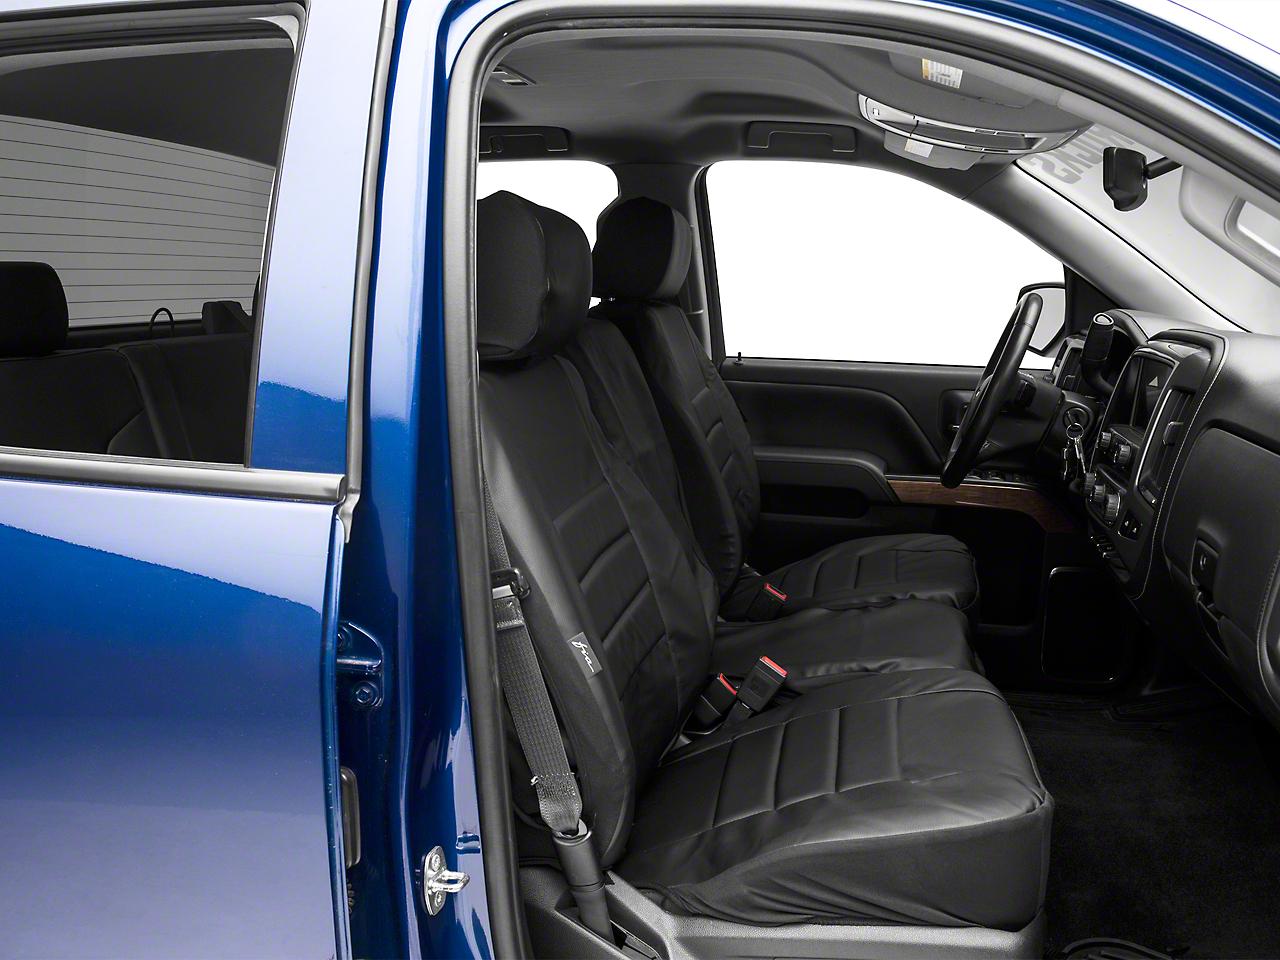 Fia Custom Fit Leatherlite Front Seat Covers - Black (14-18 Silverado 1500 w/ Bench Seat)